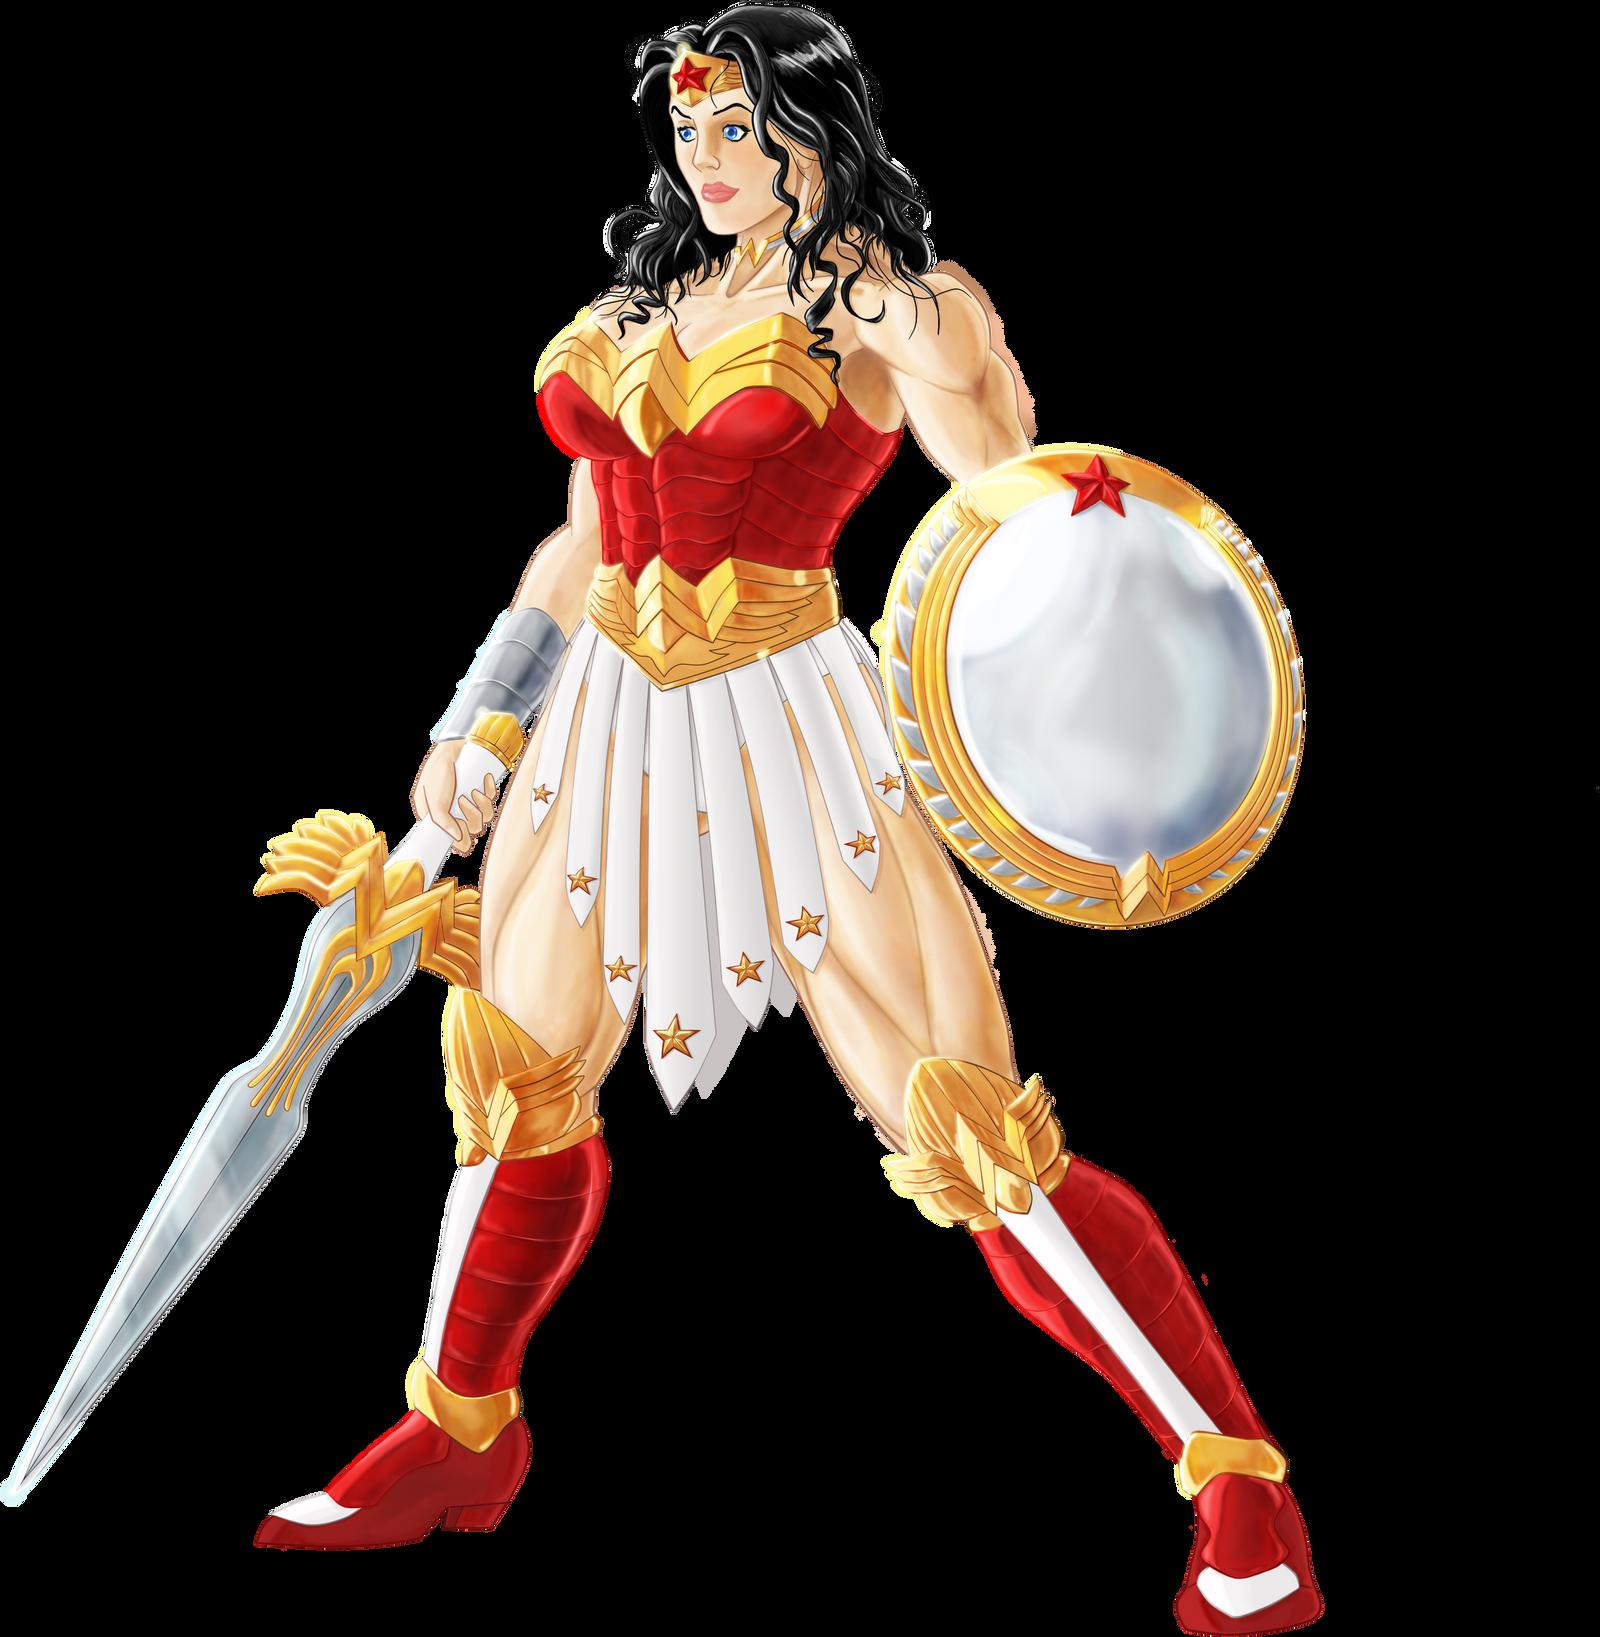 WONDER WOMAN Amazon Warrior by danelsan on DeviantArt